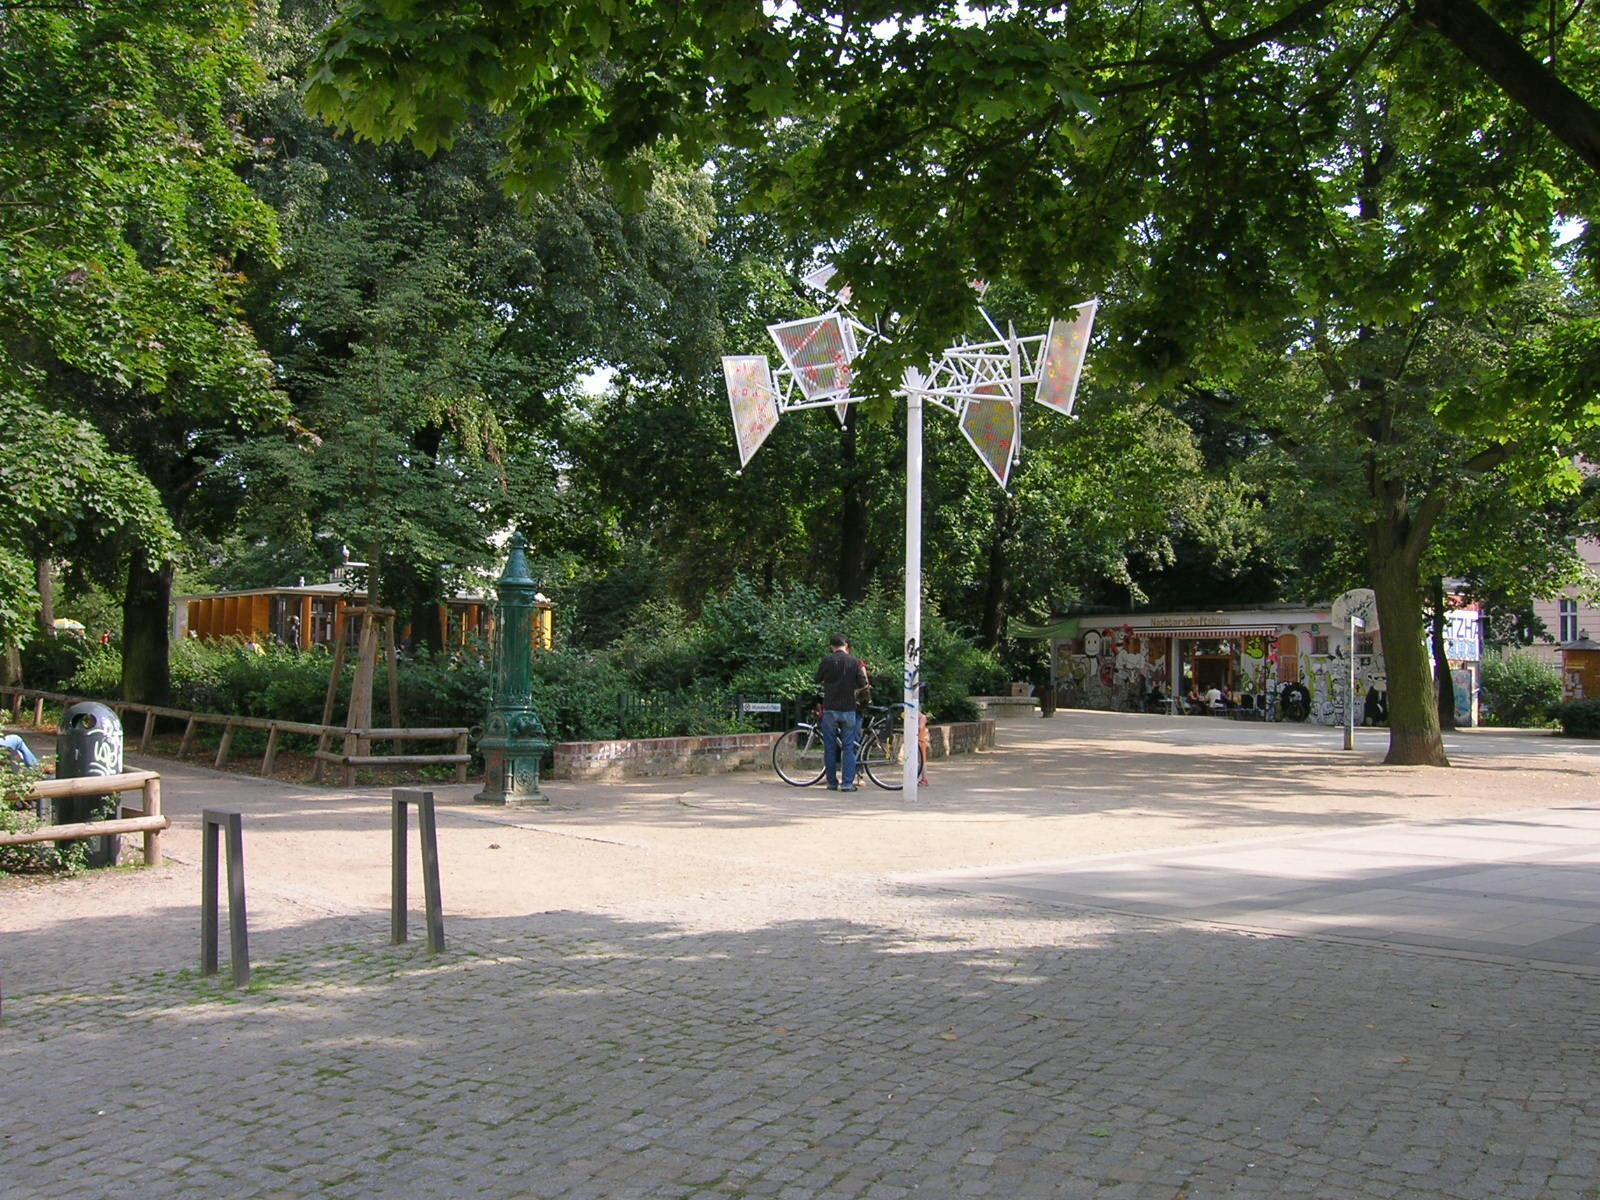 Helmholtzplatz, Prenzlauer Berg, Berlin - Quelle: Wikimedia